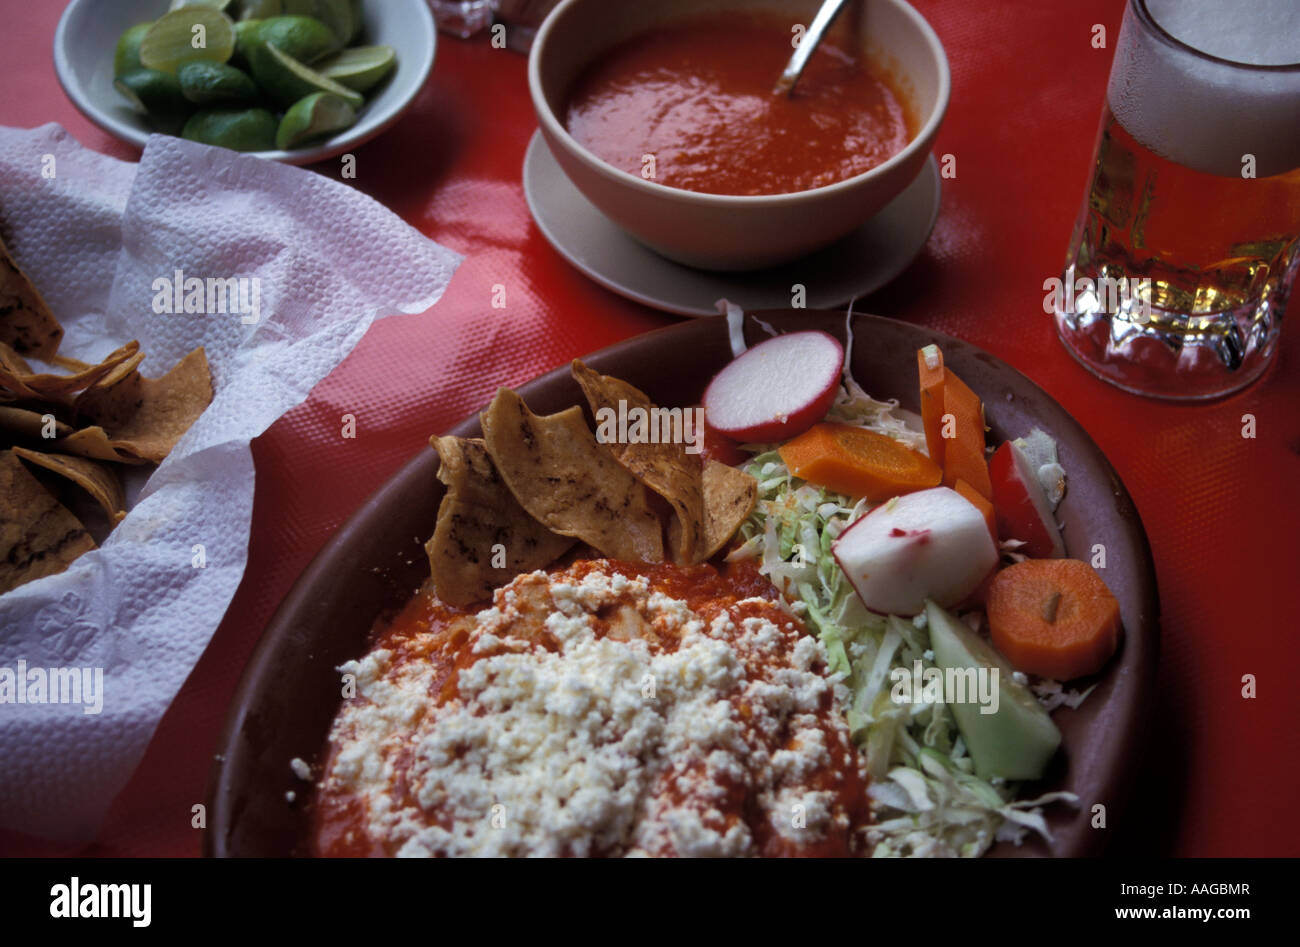 Enchiladas con Queso served in a restaurant Acapulco de Juárez Guerrero Mexico - Stock Image